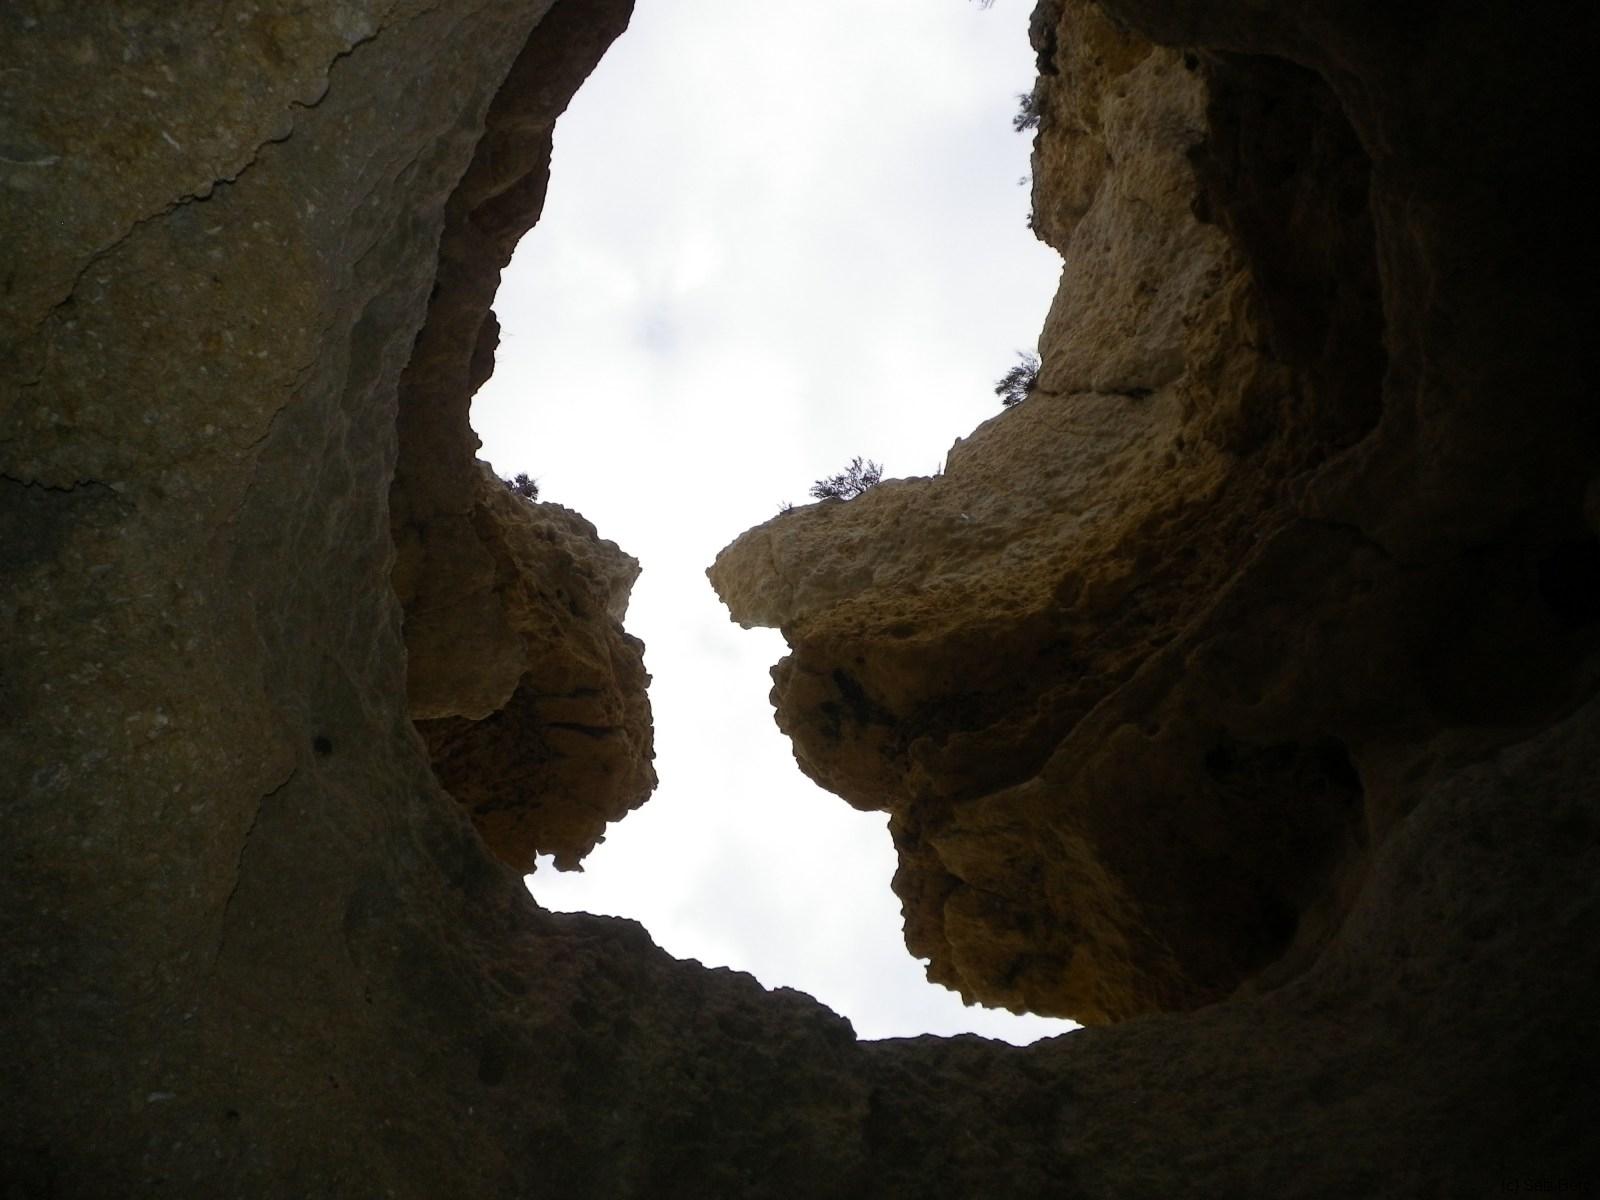 Algarve-391-IMGP5130